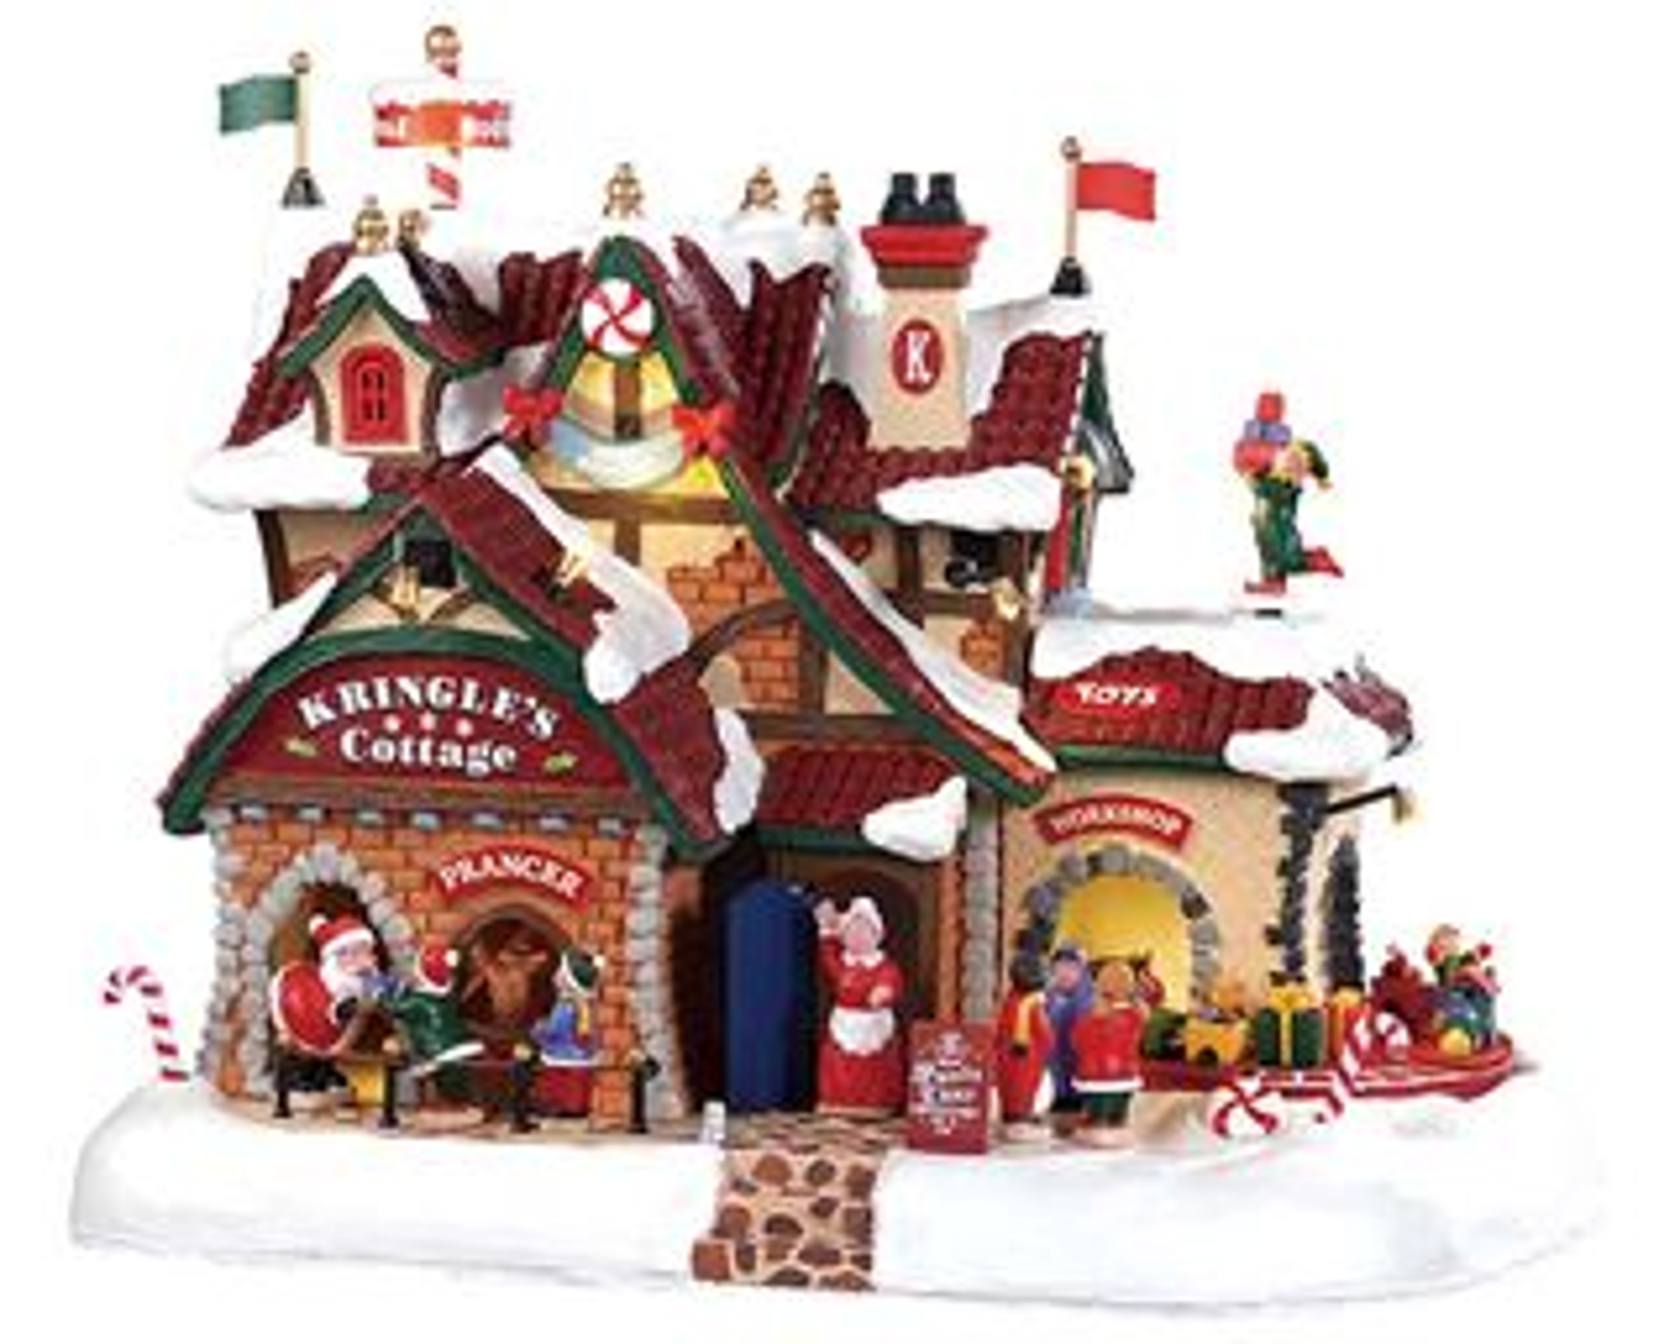 kringle-s-cottage-